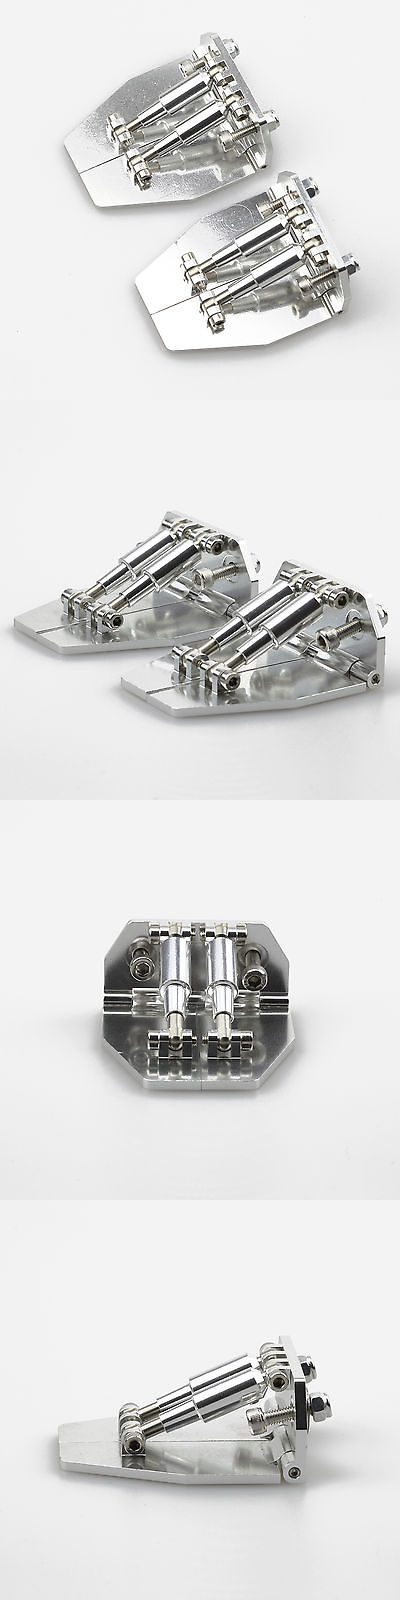 2PC CNC Aluminum Trim Tabs 51mm x 62mm x 26mm Silver for Medium-Size RC Boat